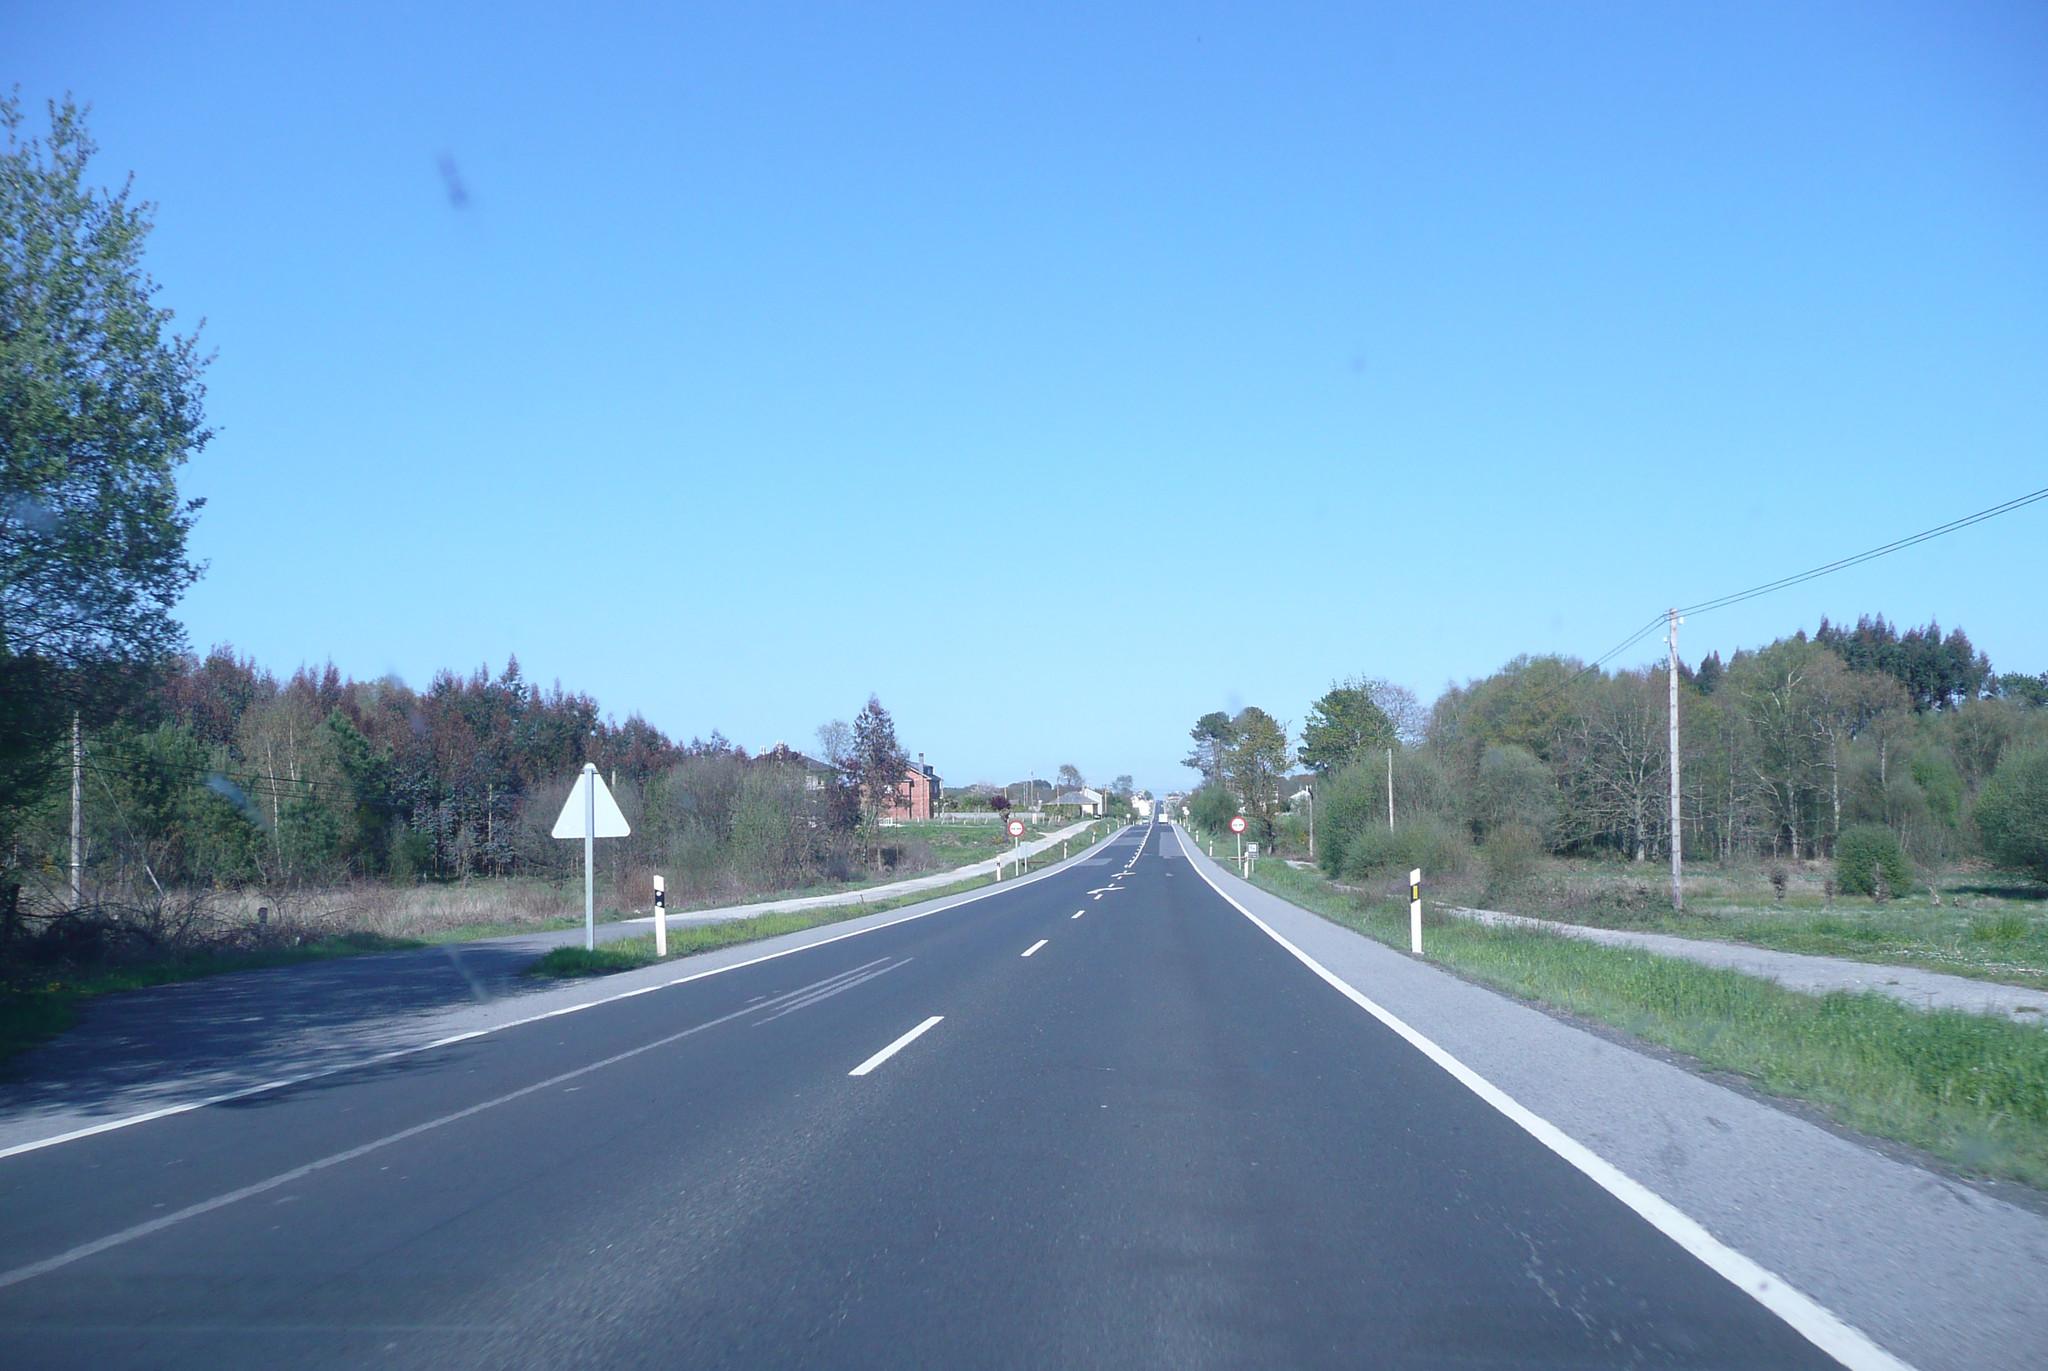 Tramos de carretera de doble sentido   Foto: Creativecommons.org